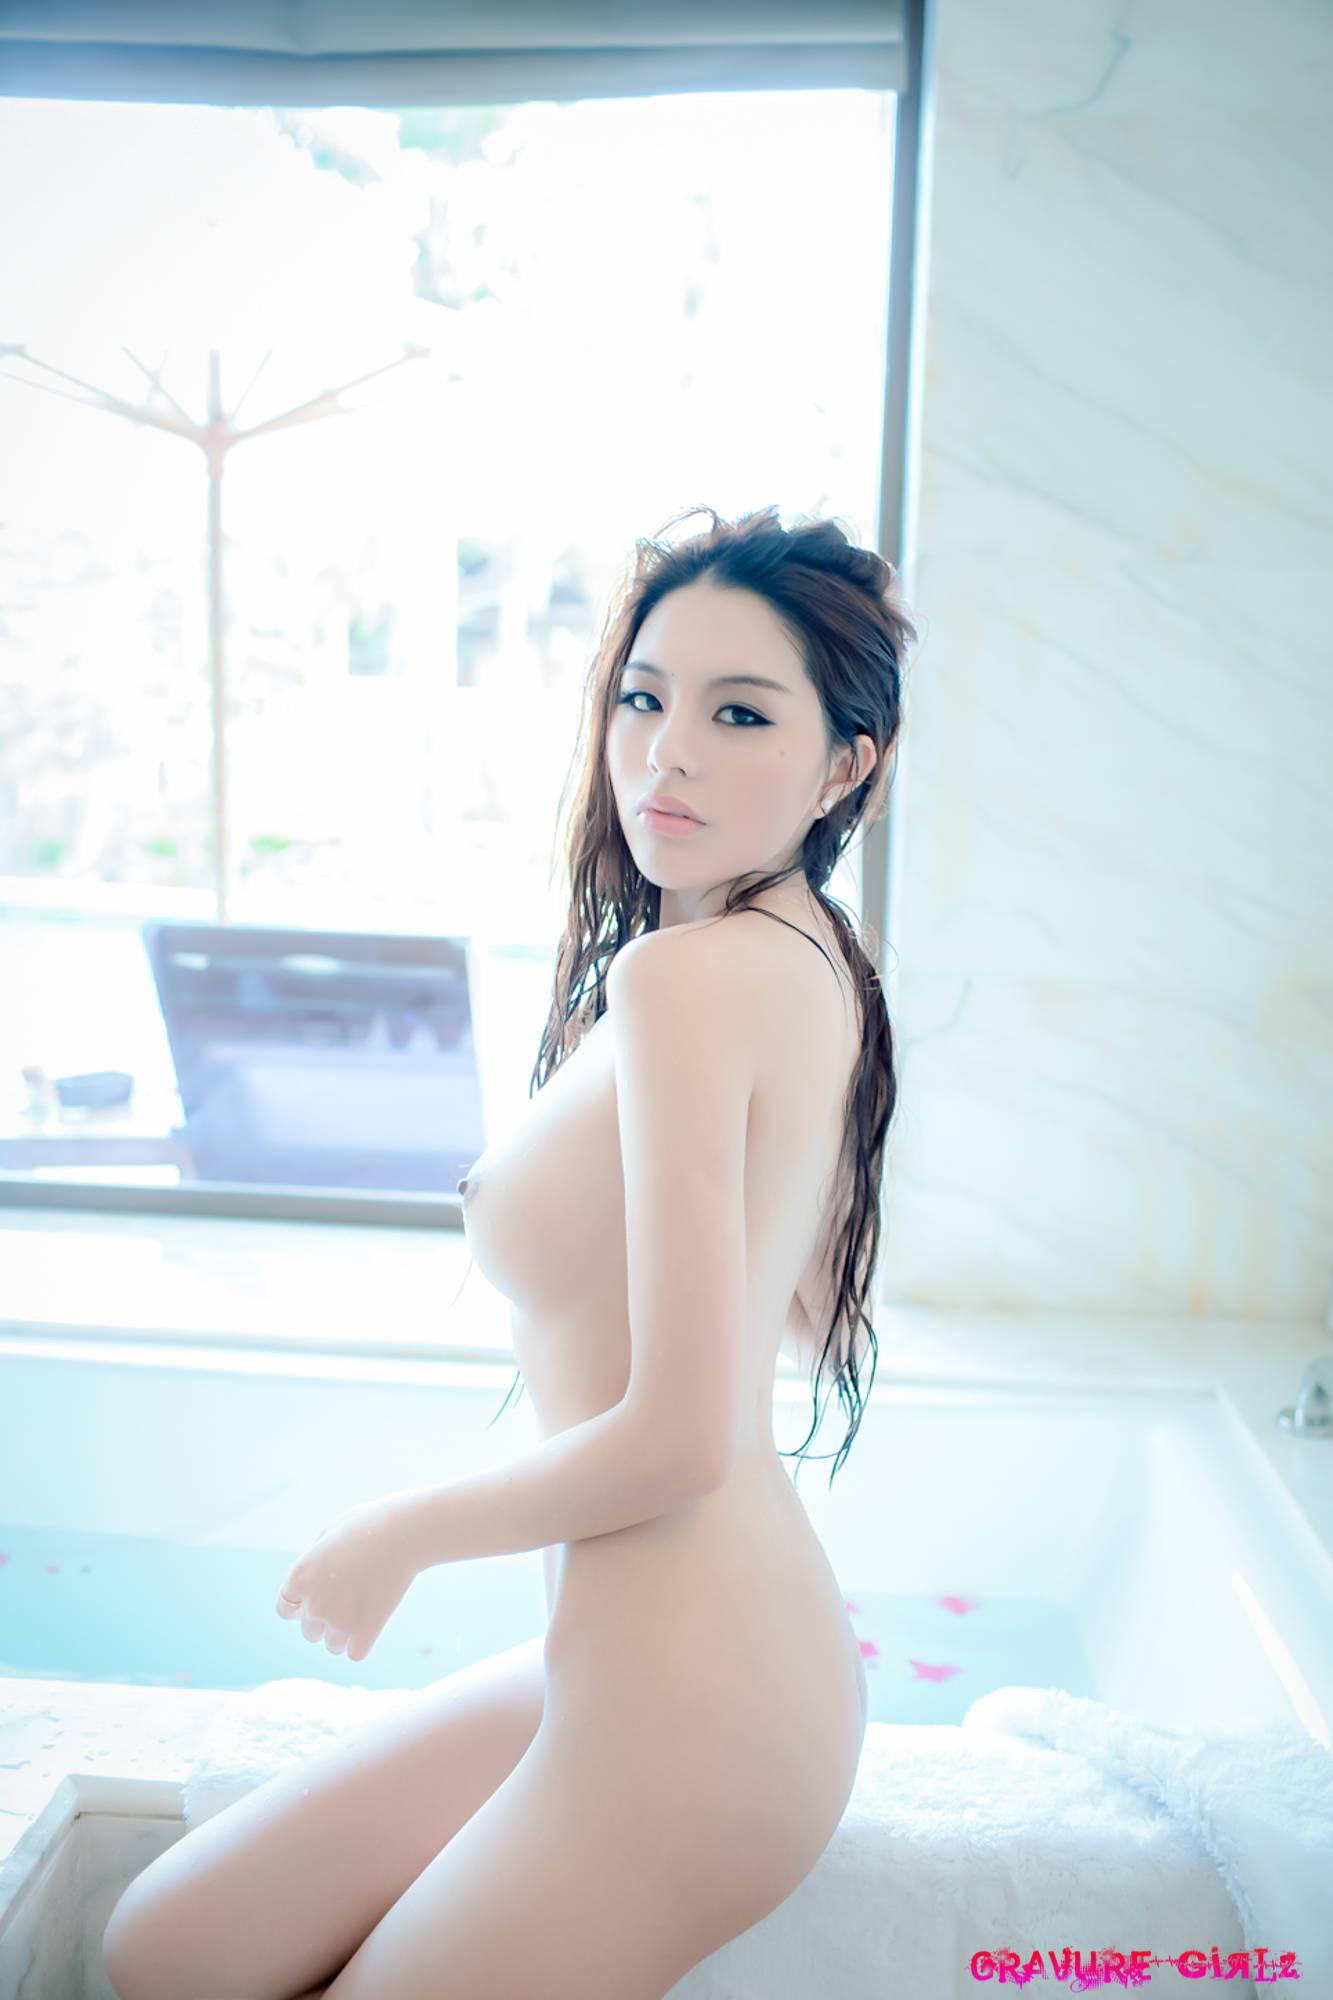 Gorgeous big tits model krystal swift public gangbang orgy 8